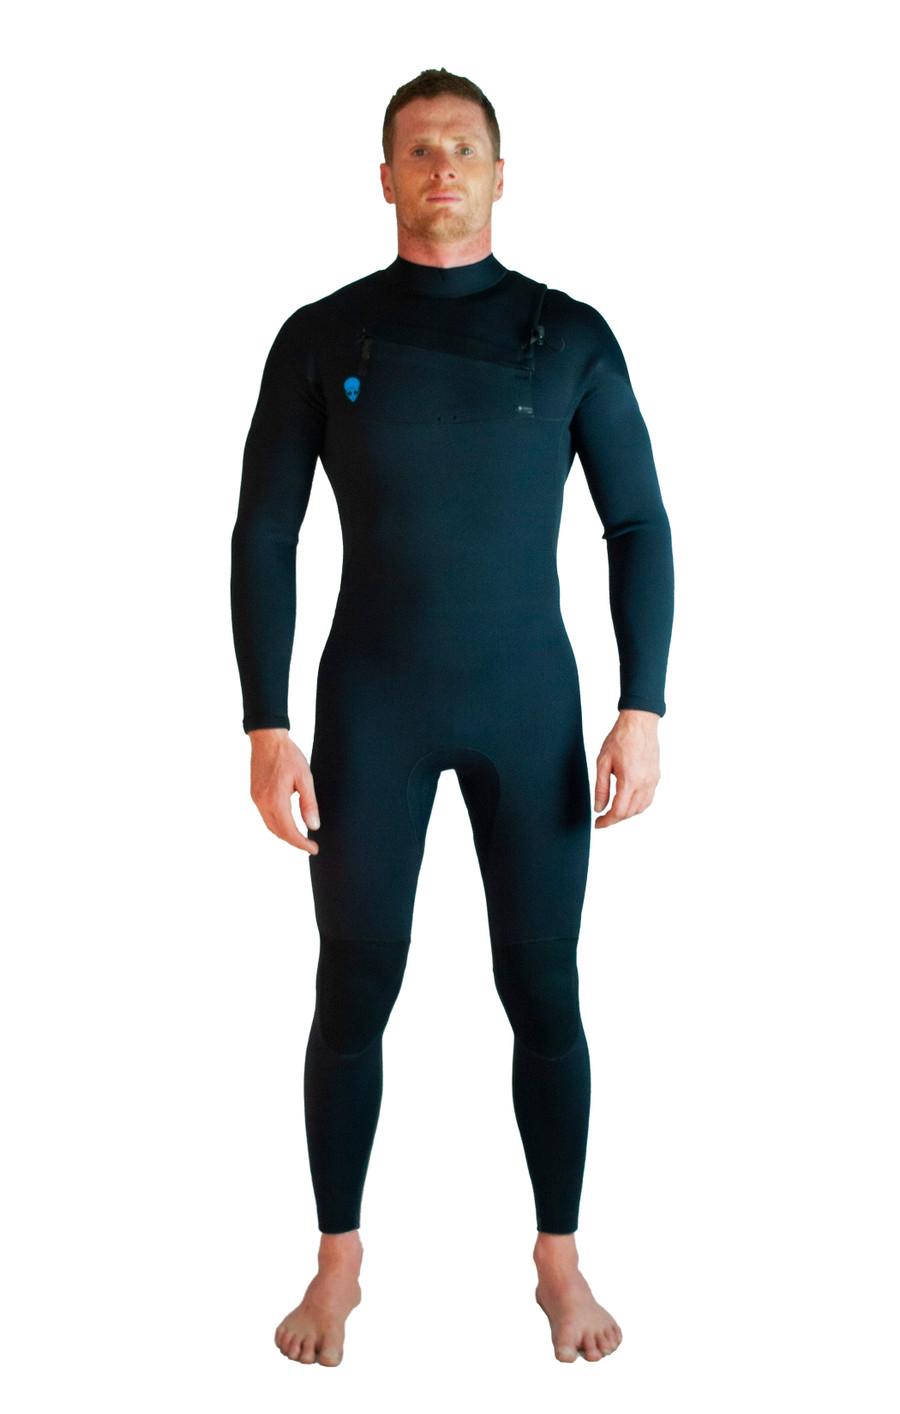 Lunasurf 4.3mm Yamamoto mens wetsuit